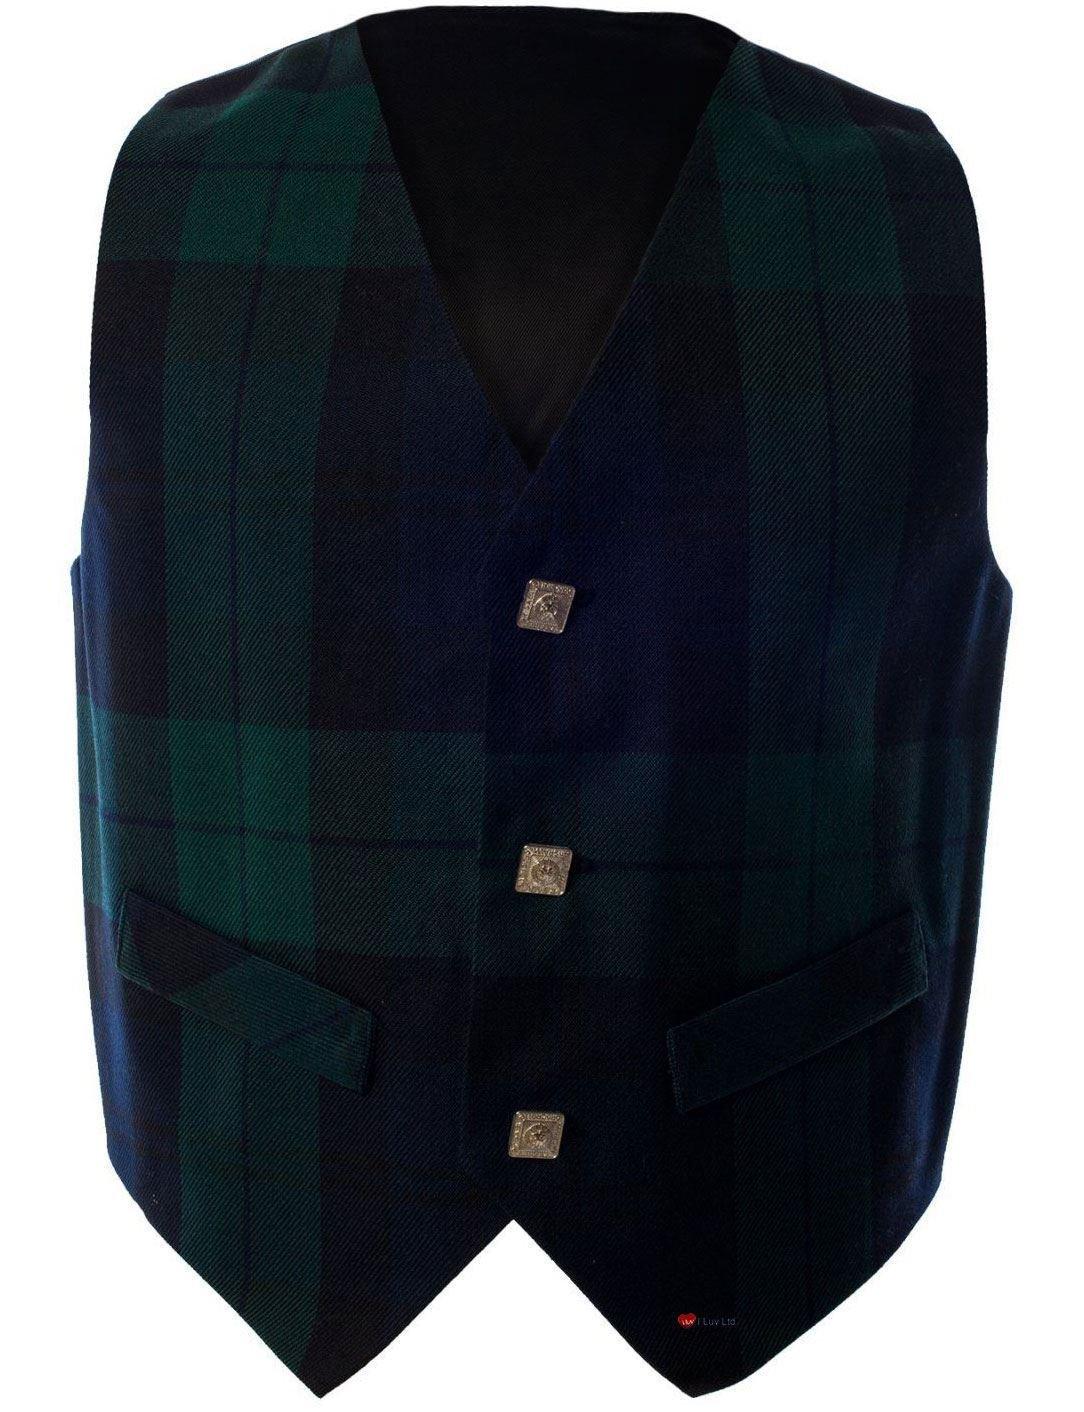 Boys Waistcoat, Silk Back Adjustable buckle Black Watch Tartan 2 year